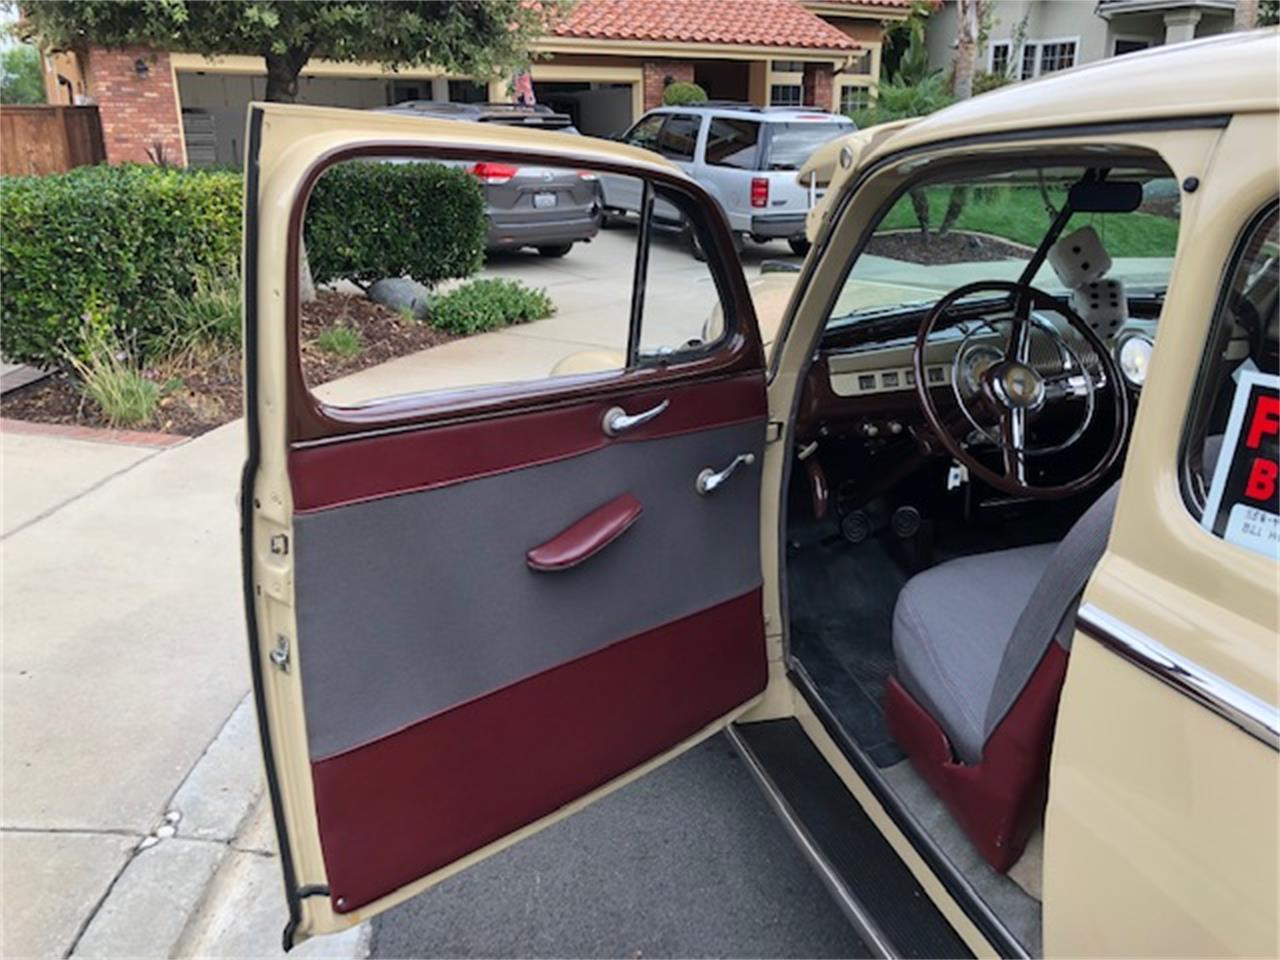 1947 Ford Sedan (CC-1152992) for sale in Poway, California